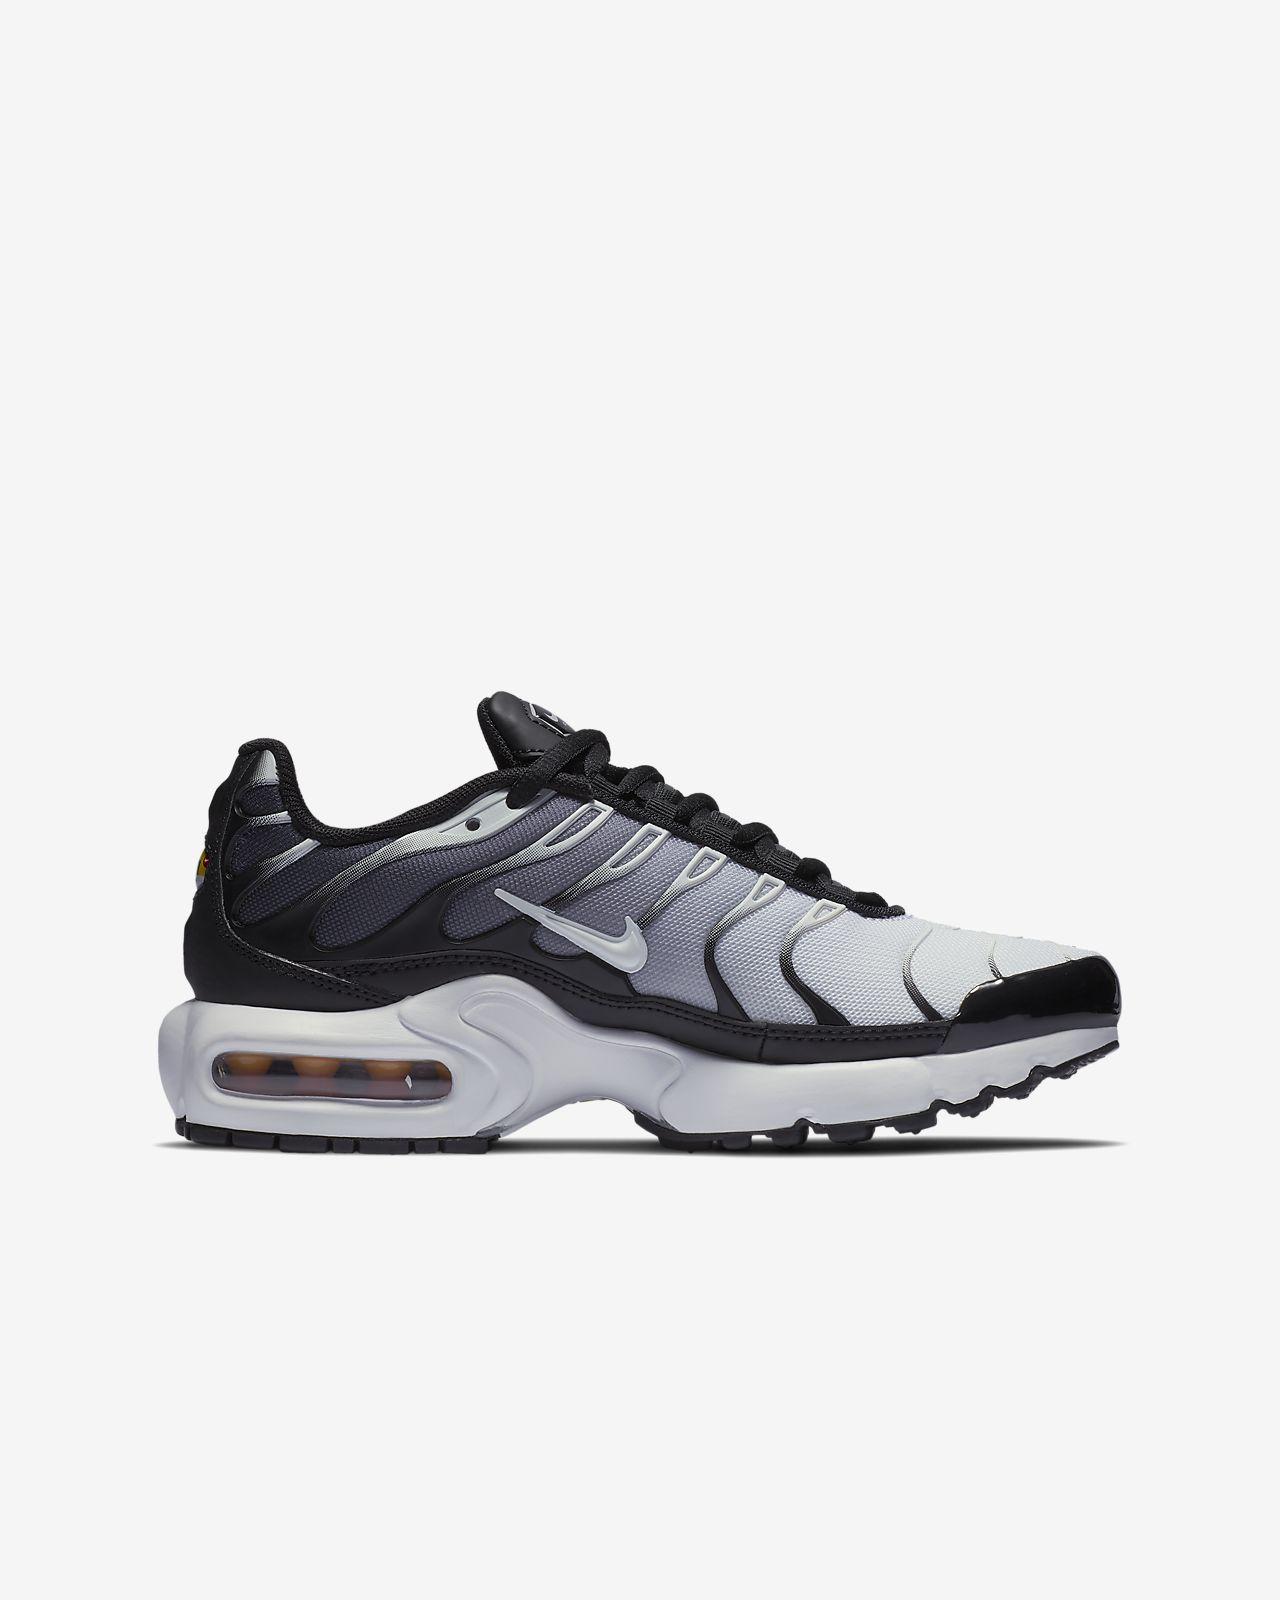 Nike Tuned 1 - Damen Schuhe Grey Größe 37.5 sRnoecE2s